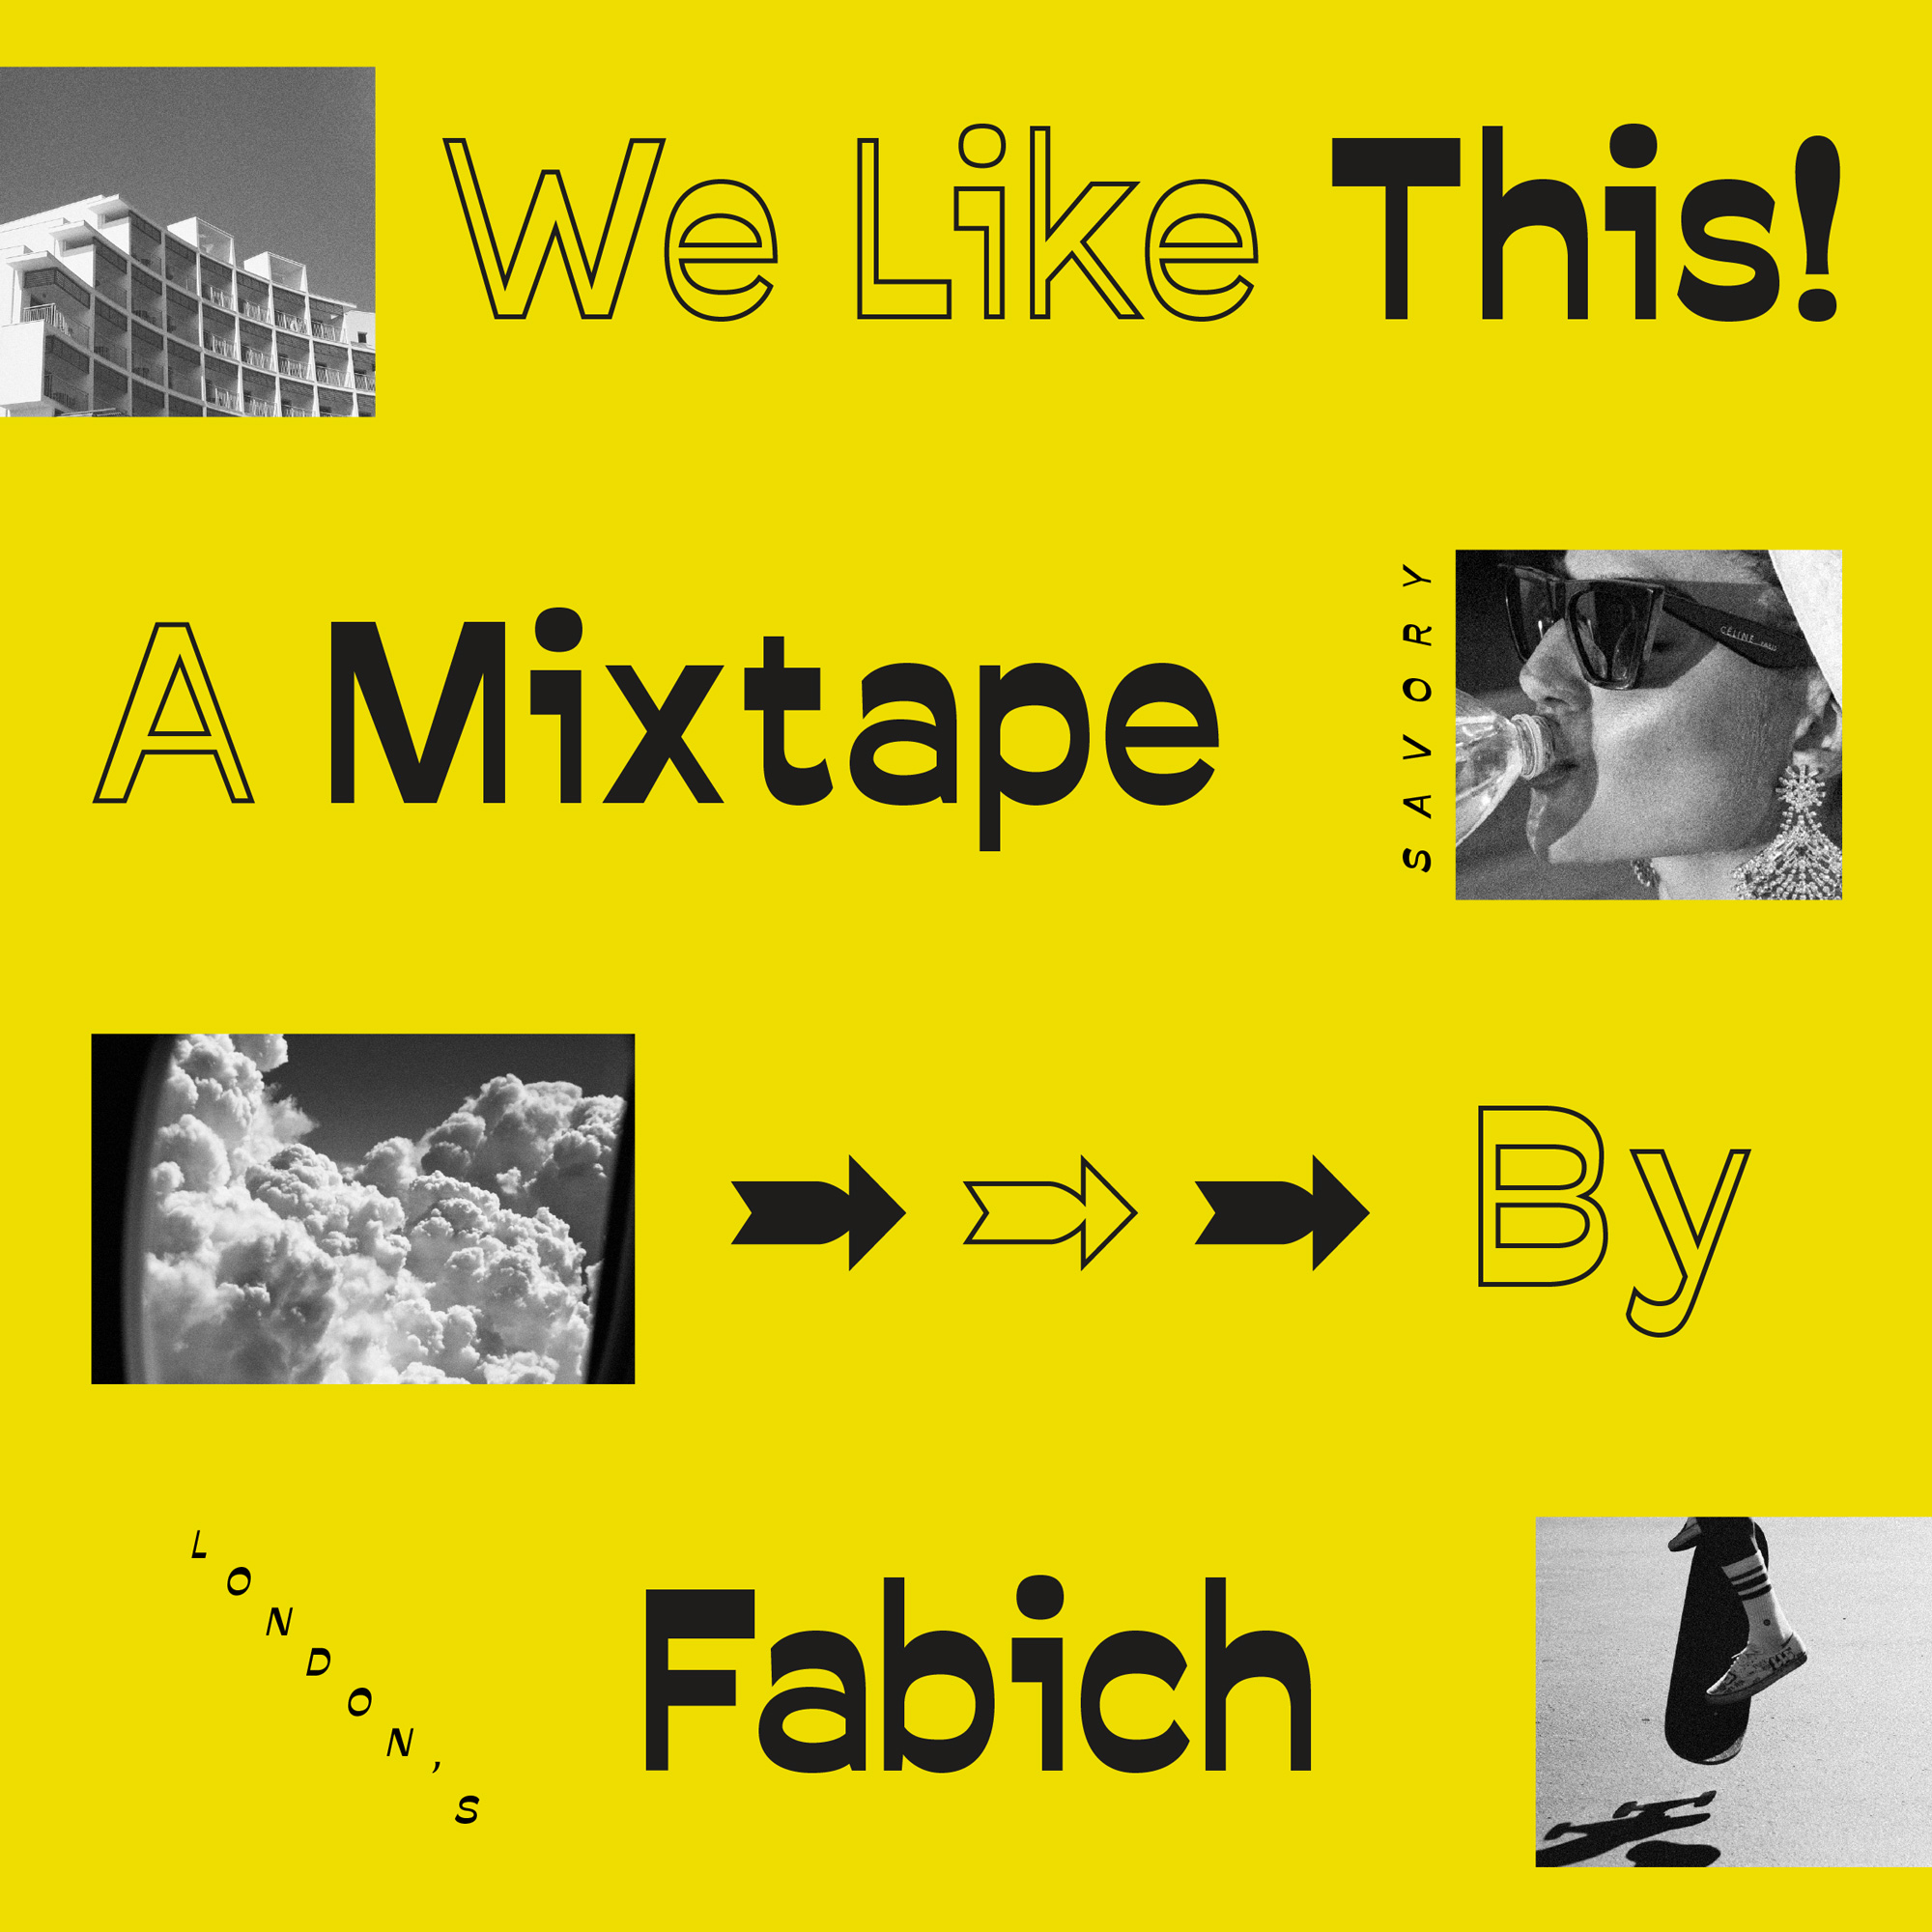 WeLikeThis-Fabich2.jpg